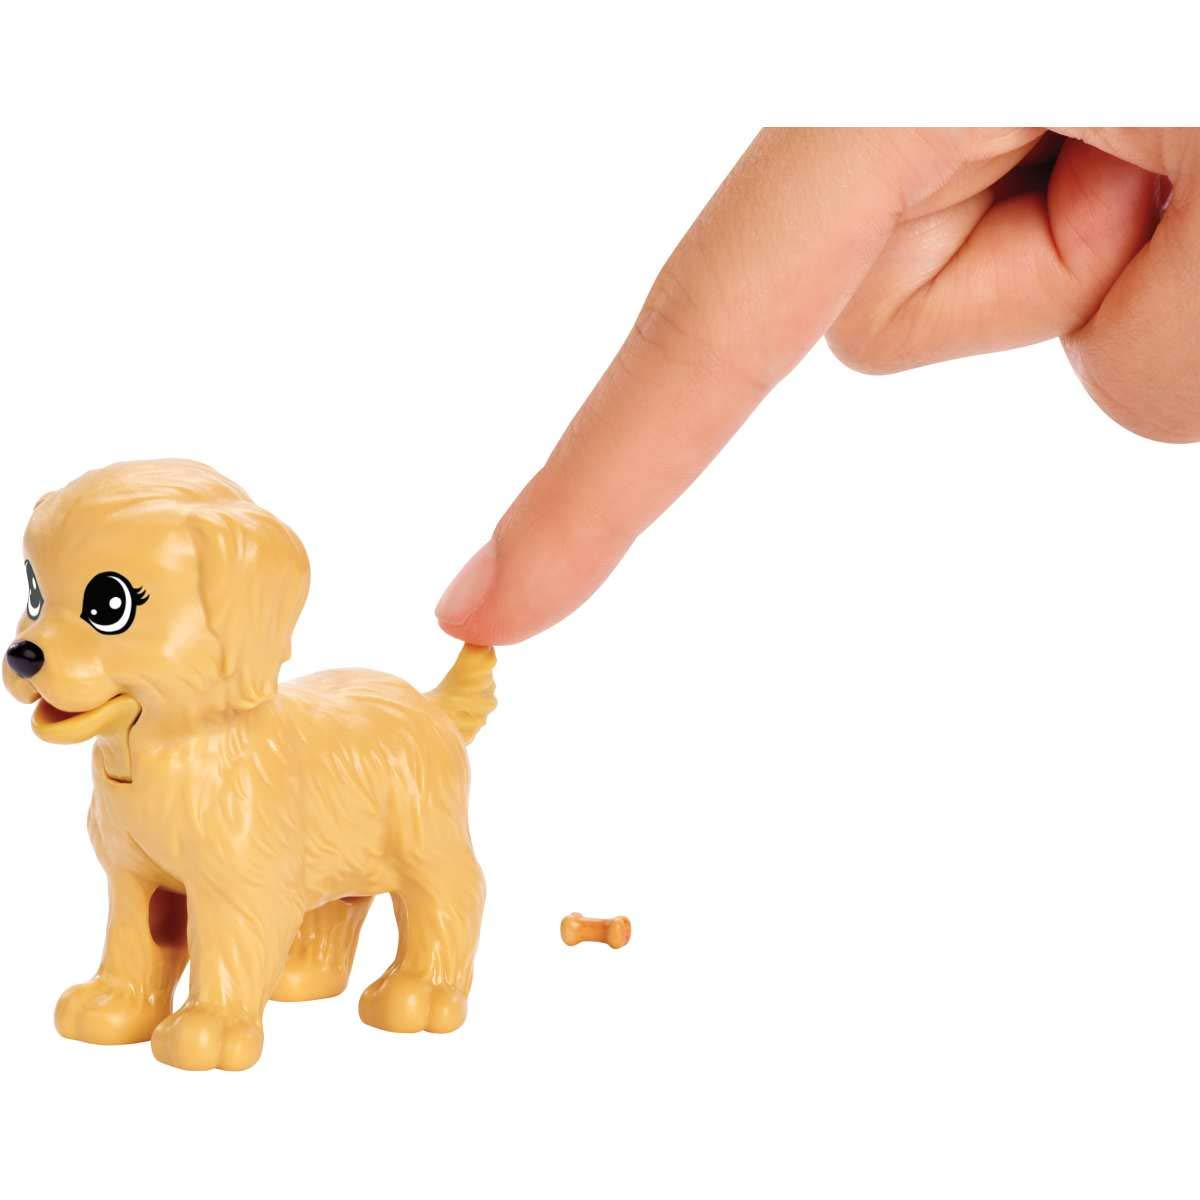 Blonde Barbie Doggy Daycare